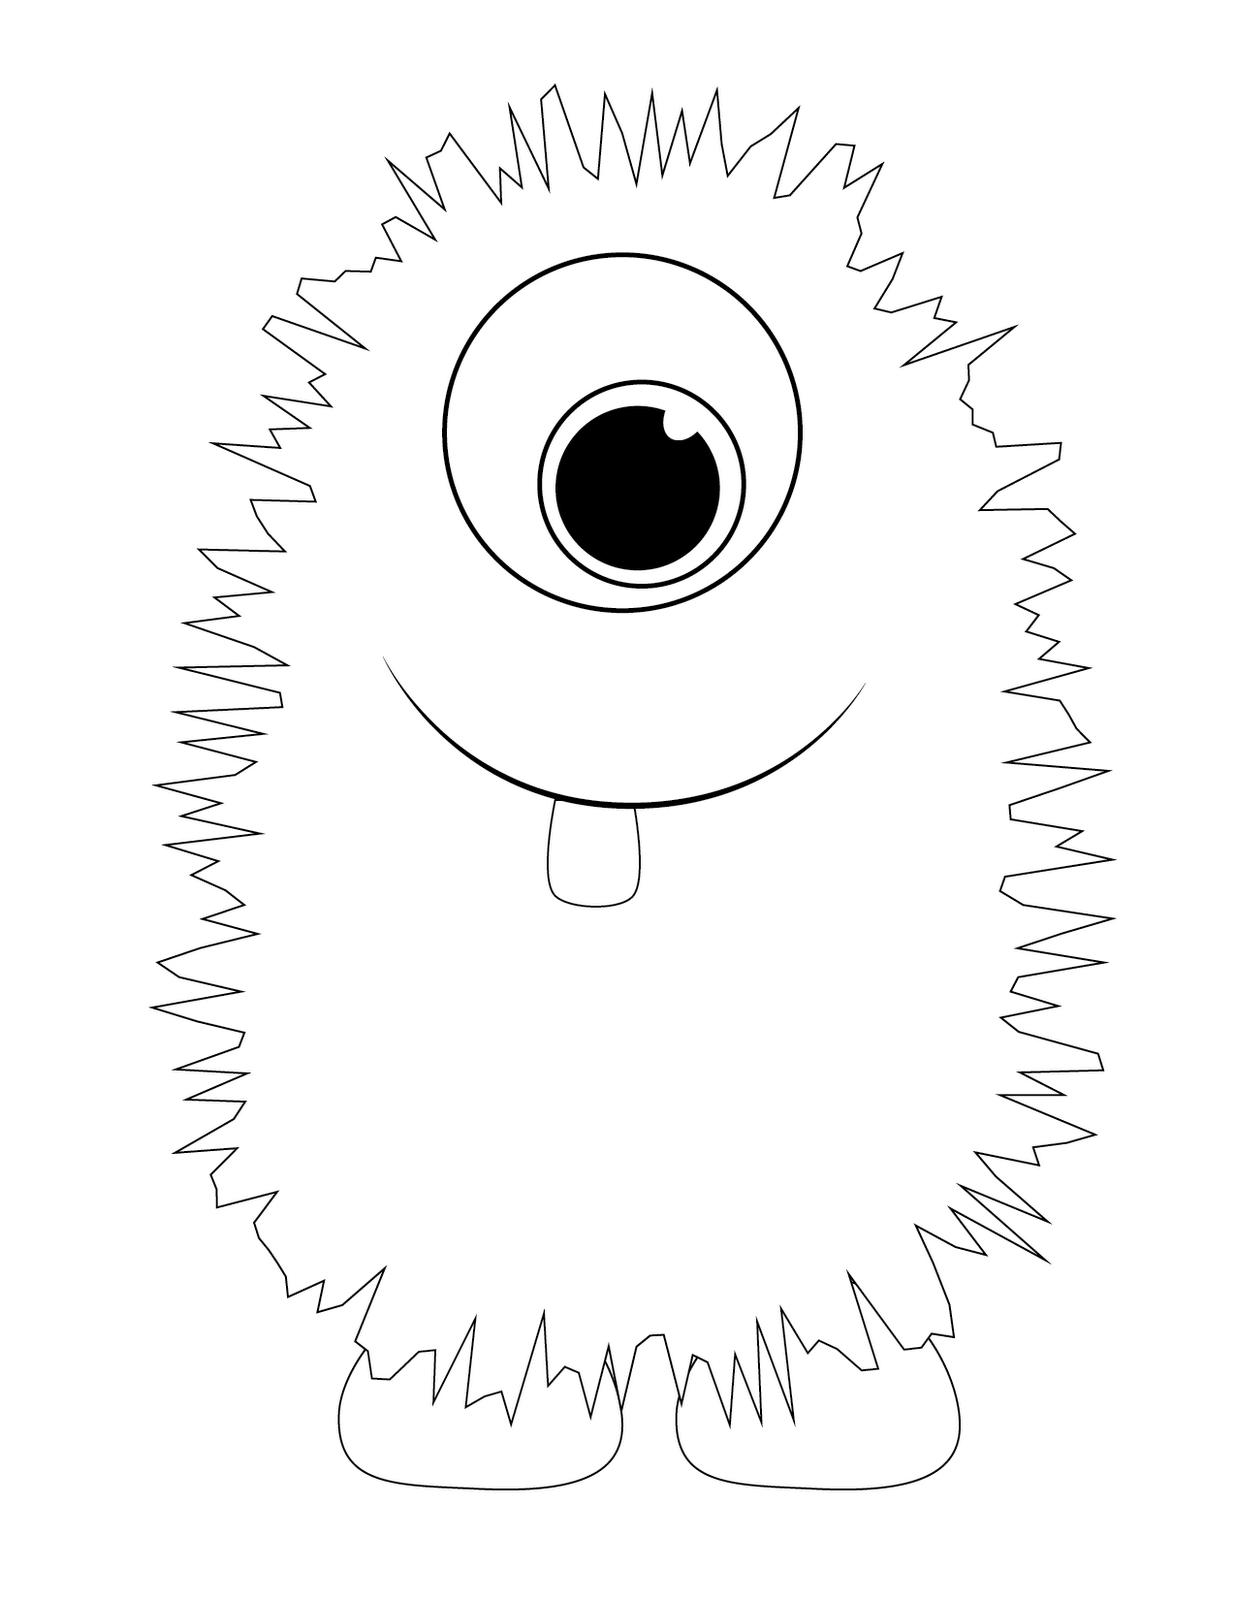 monster coloring pages - Monster Coloring Pages